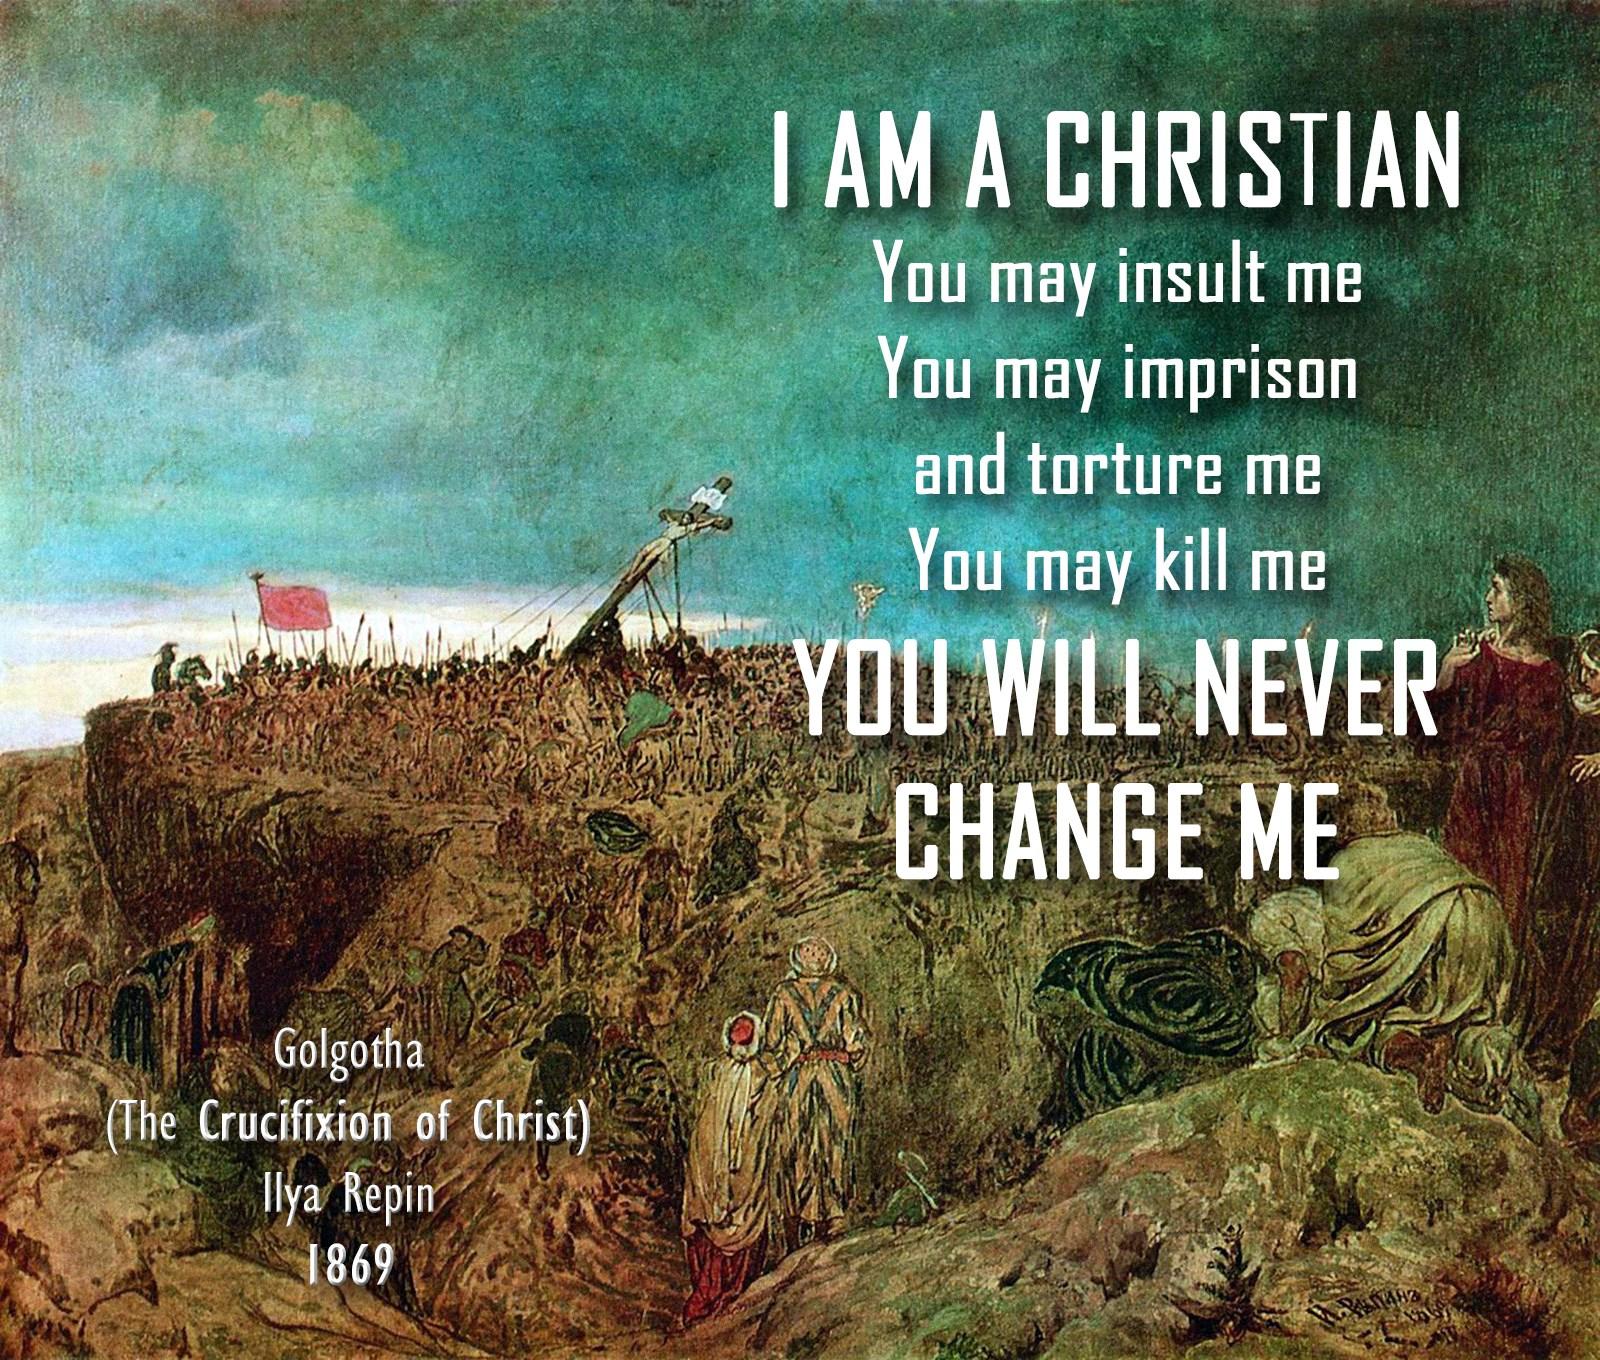 00-ilya-repin-golgotha-the-crucifixion-of-christ-1869-i-am-a-christian-180217